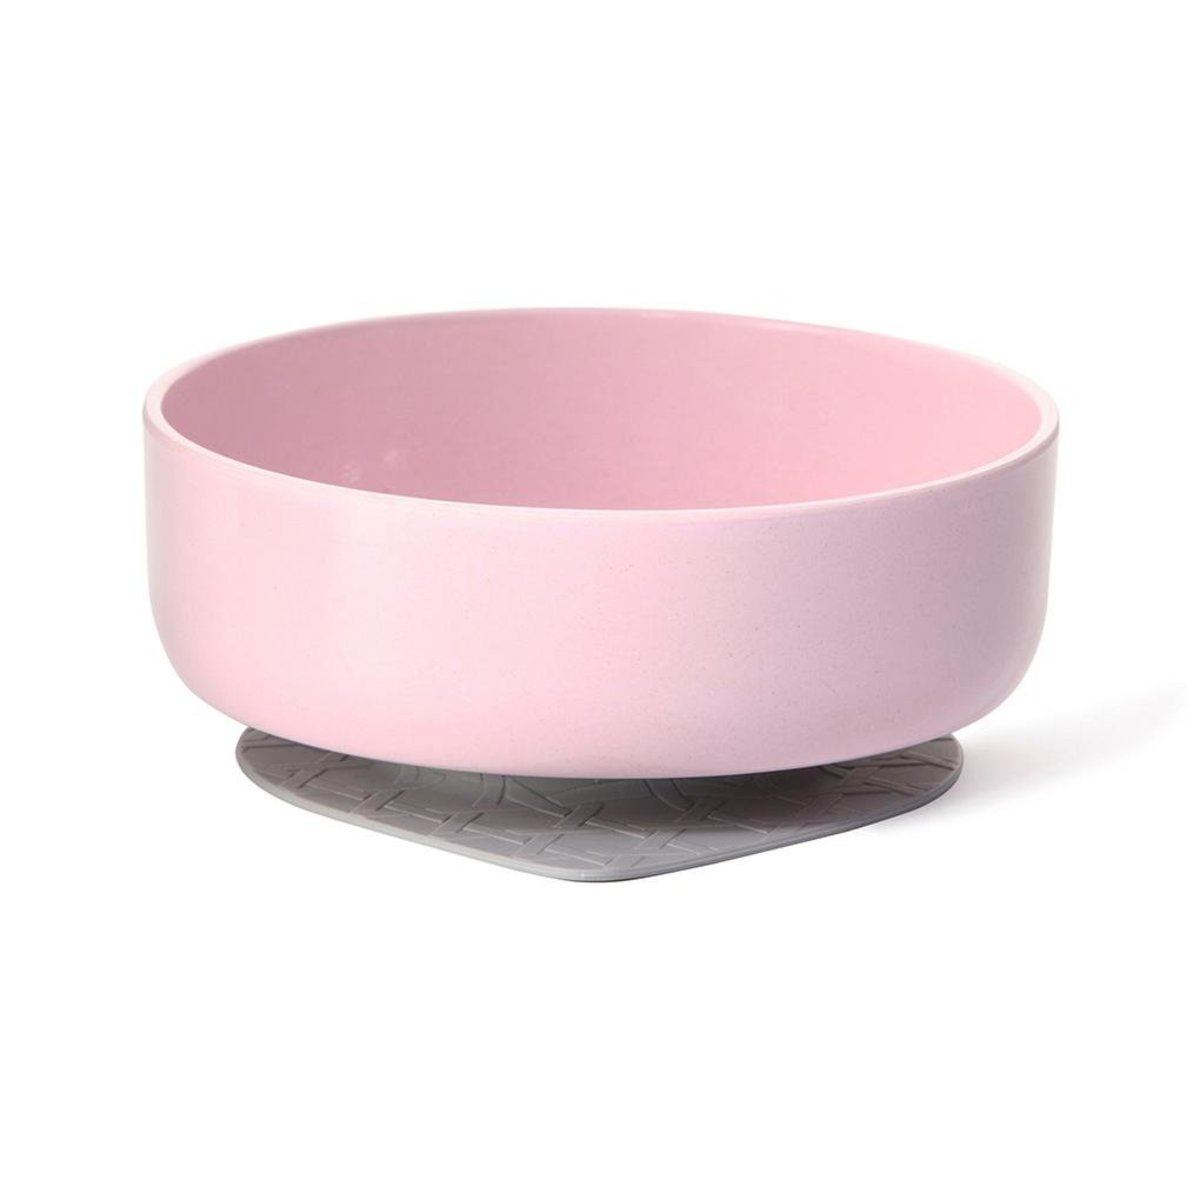 竹纖維點心碗 - Cherry Blossom